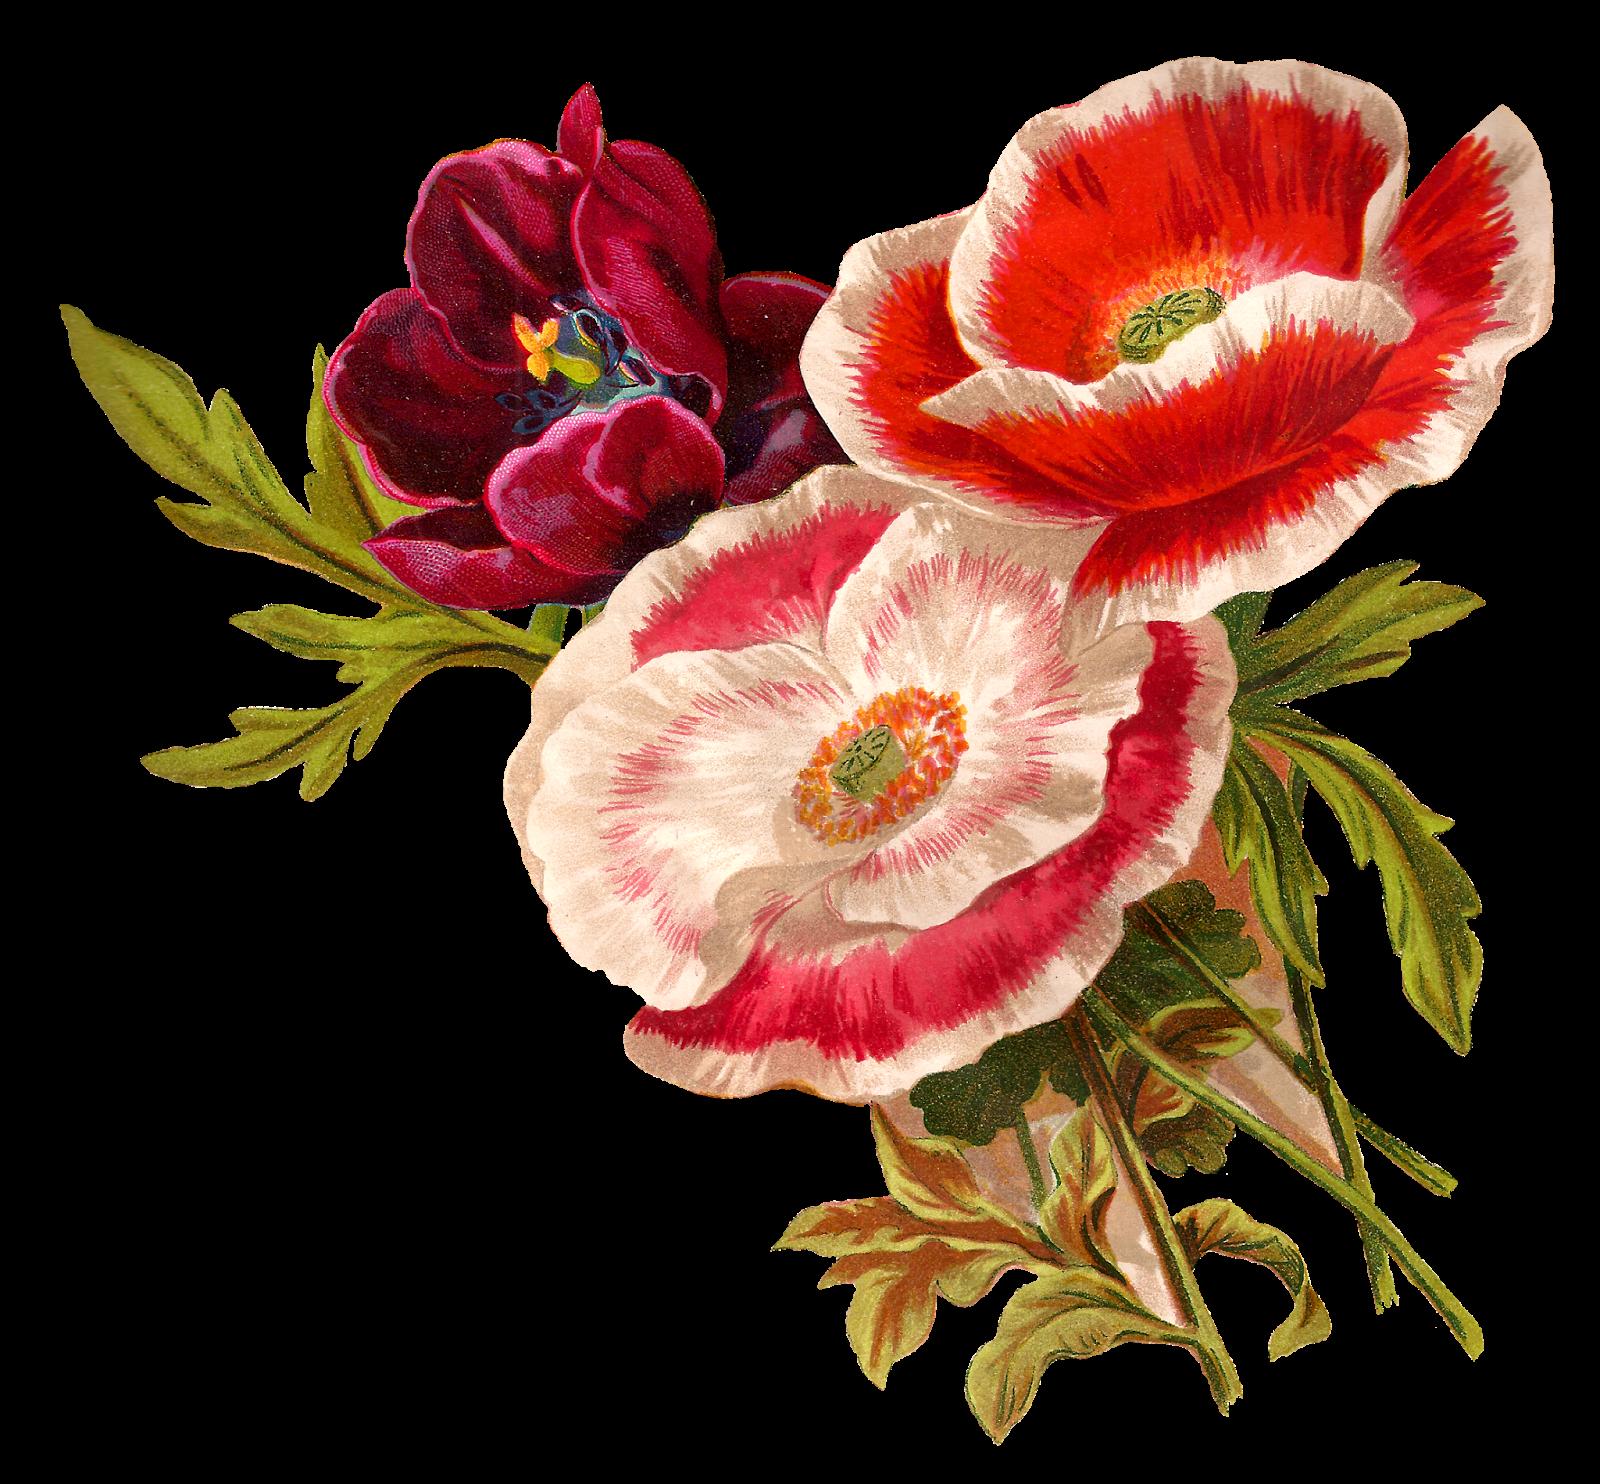 Digital flower clipart png black and white stock Antique Images: Vintage Poppy Flower Clip Art Botanical Artwork ... png black and white stock